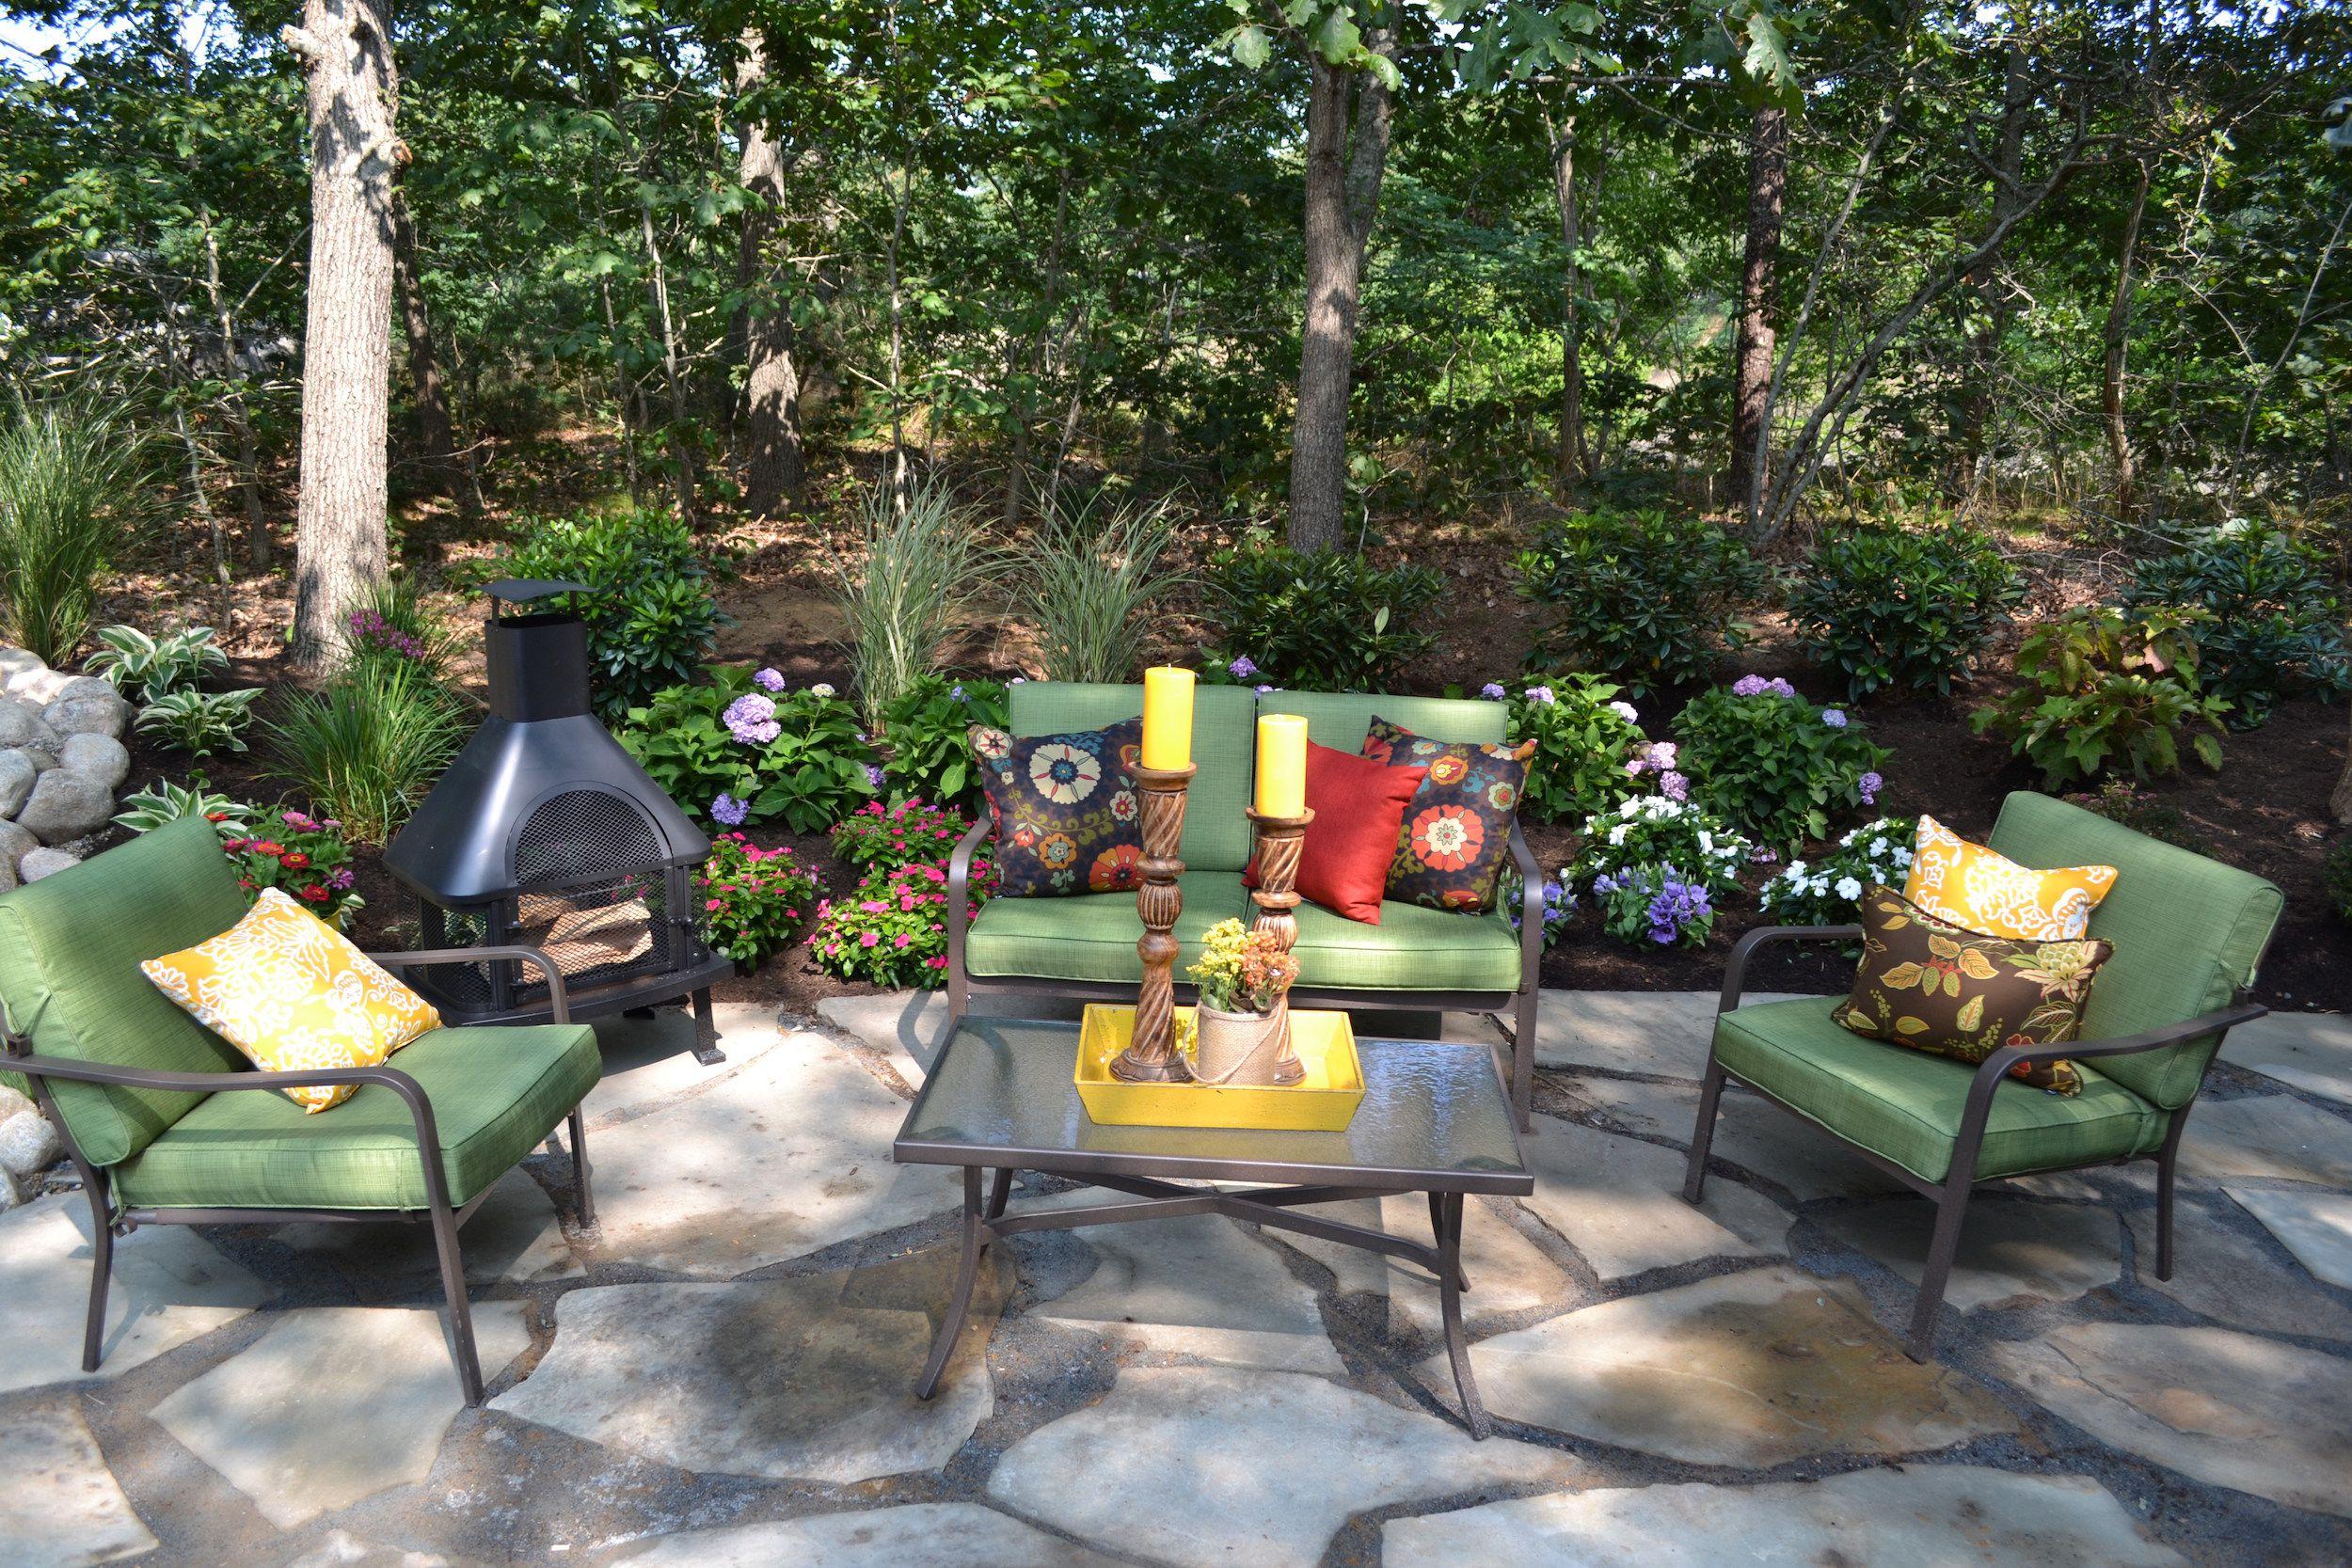 Landscaping Company in Tucson,Landscape Contractors Tucson